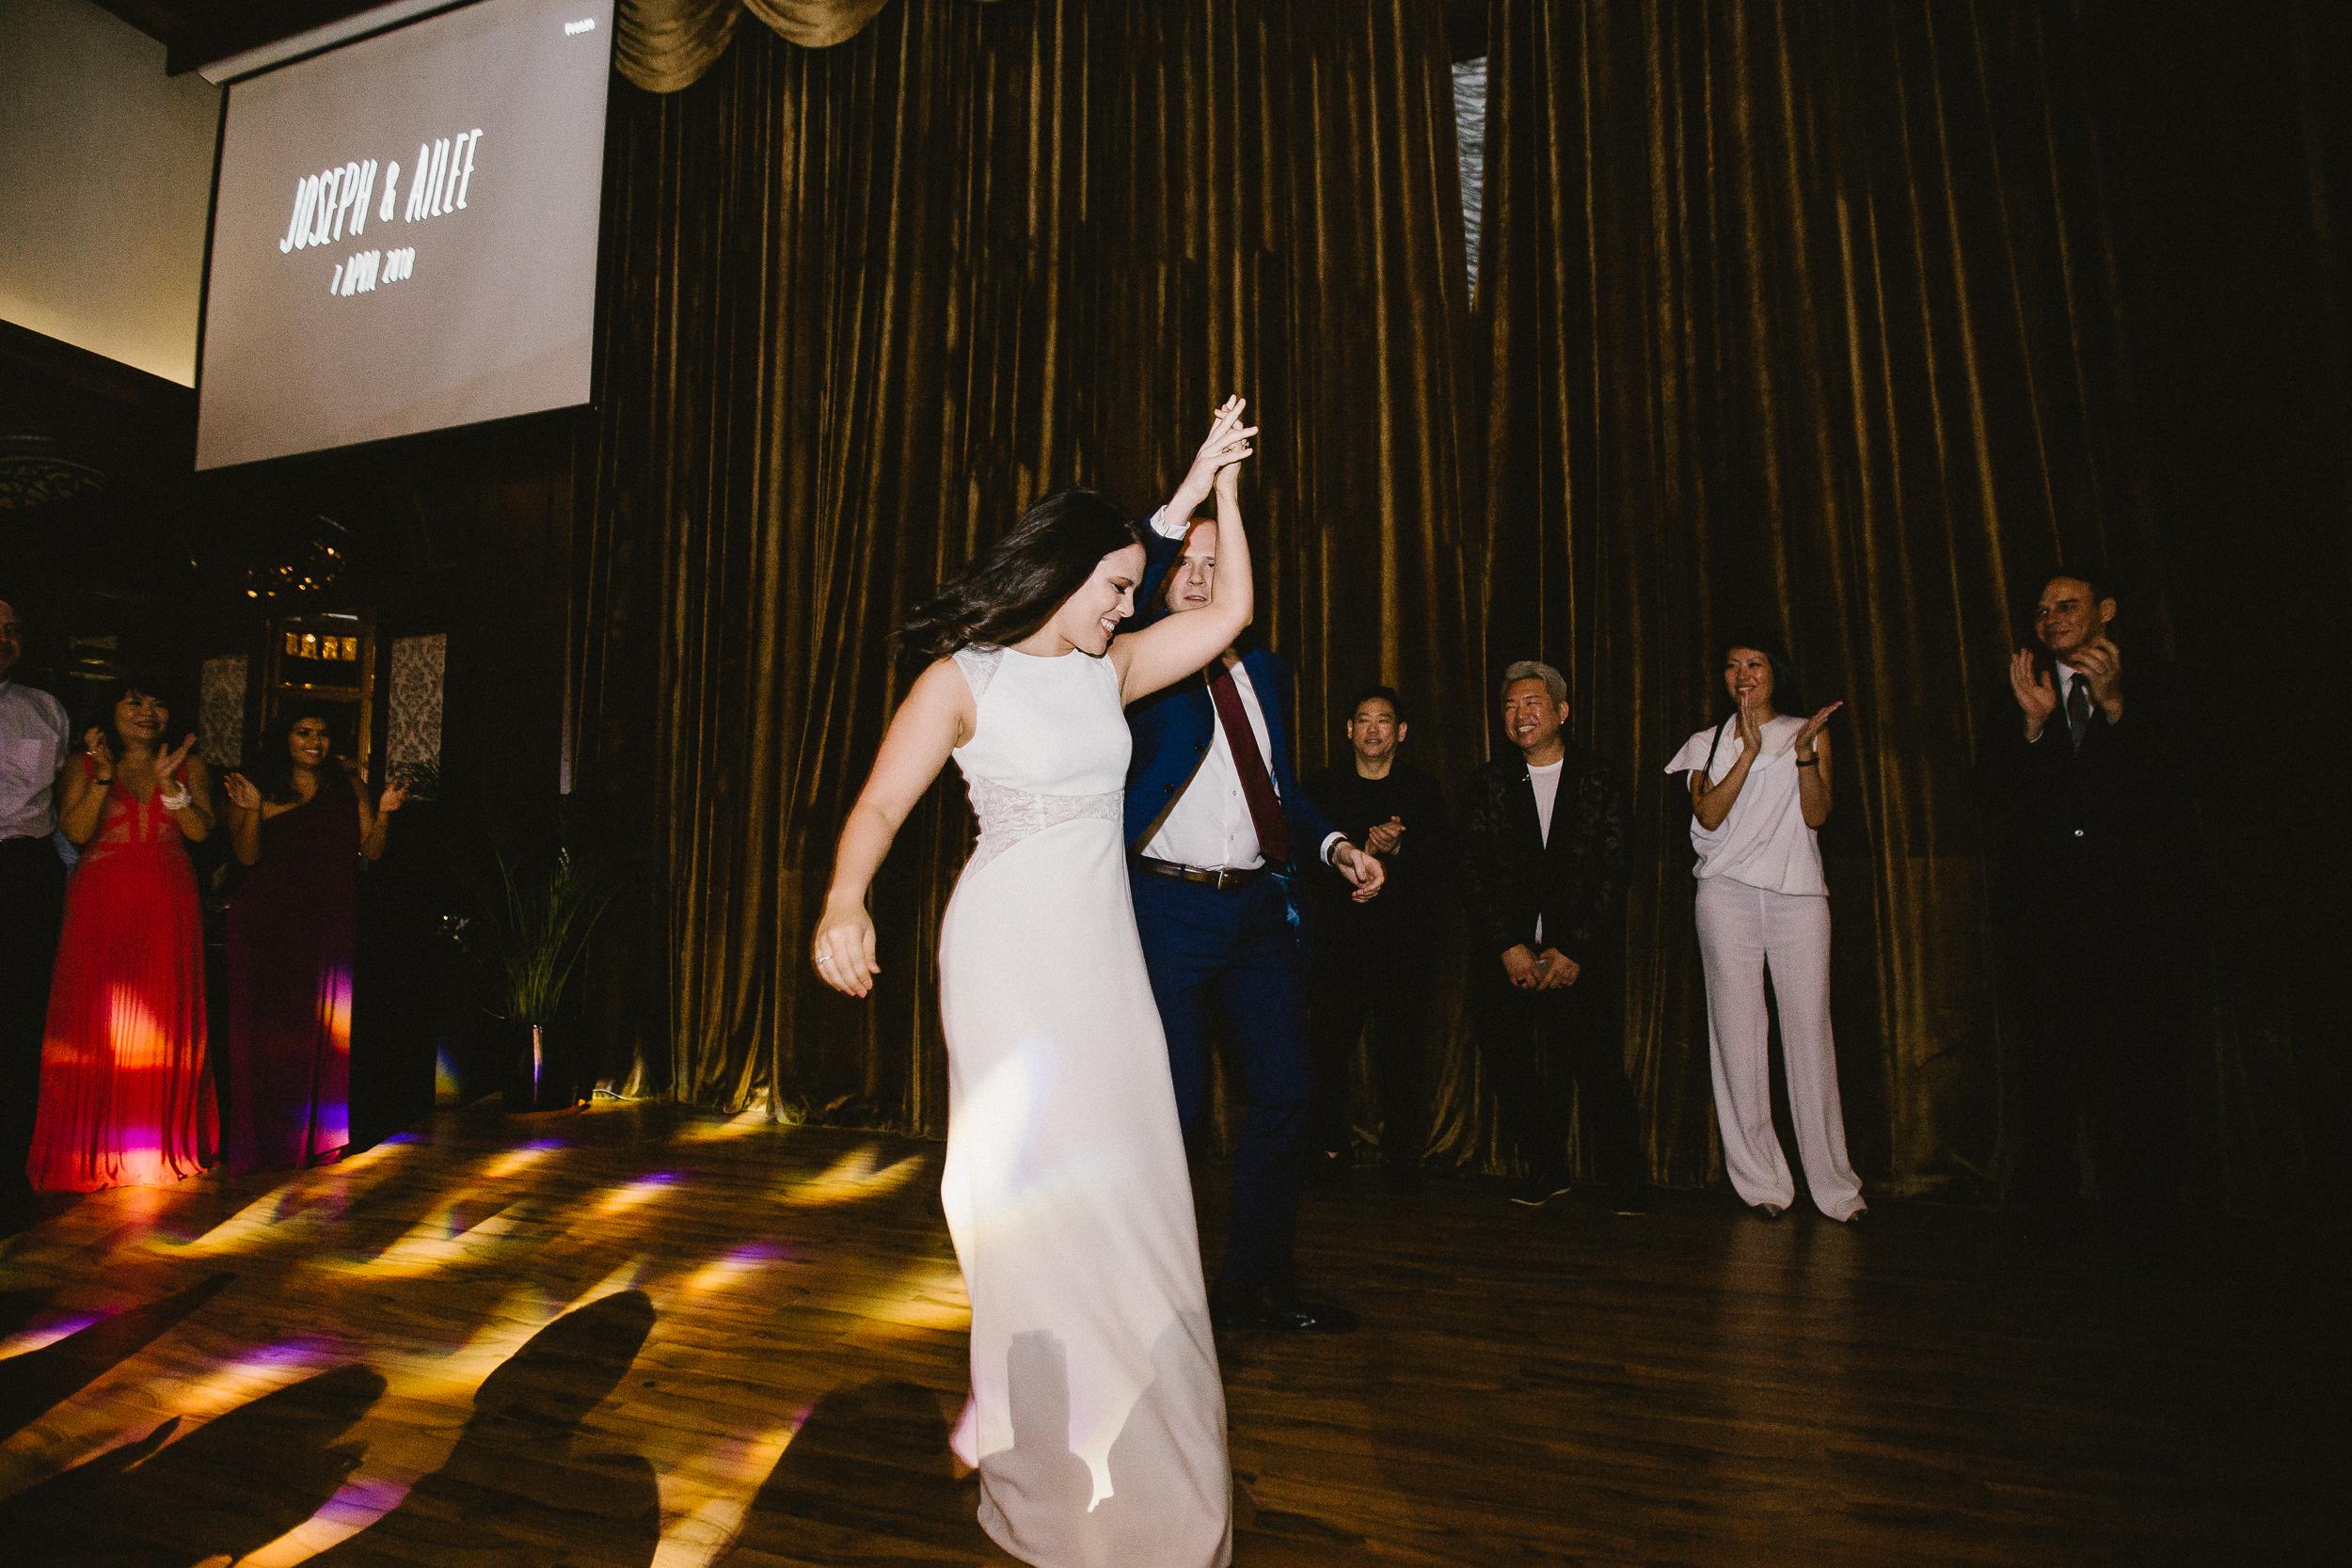 Singapore+Actual+Day+Wedding+Photographer+Raffles+Town+Club+Joseph+Ailee-0077.jpg